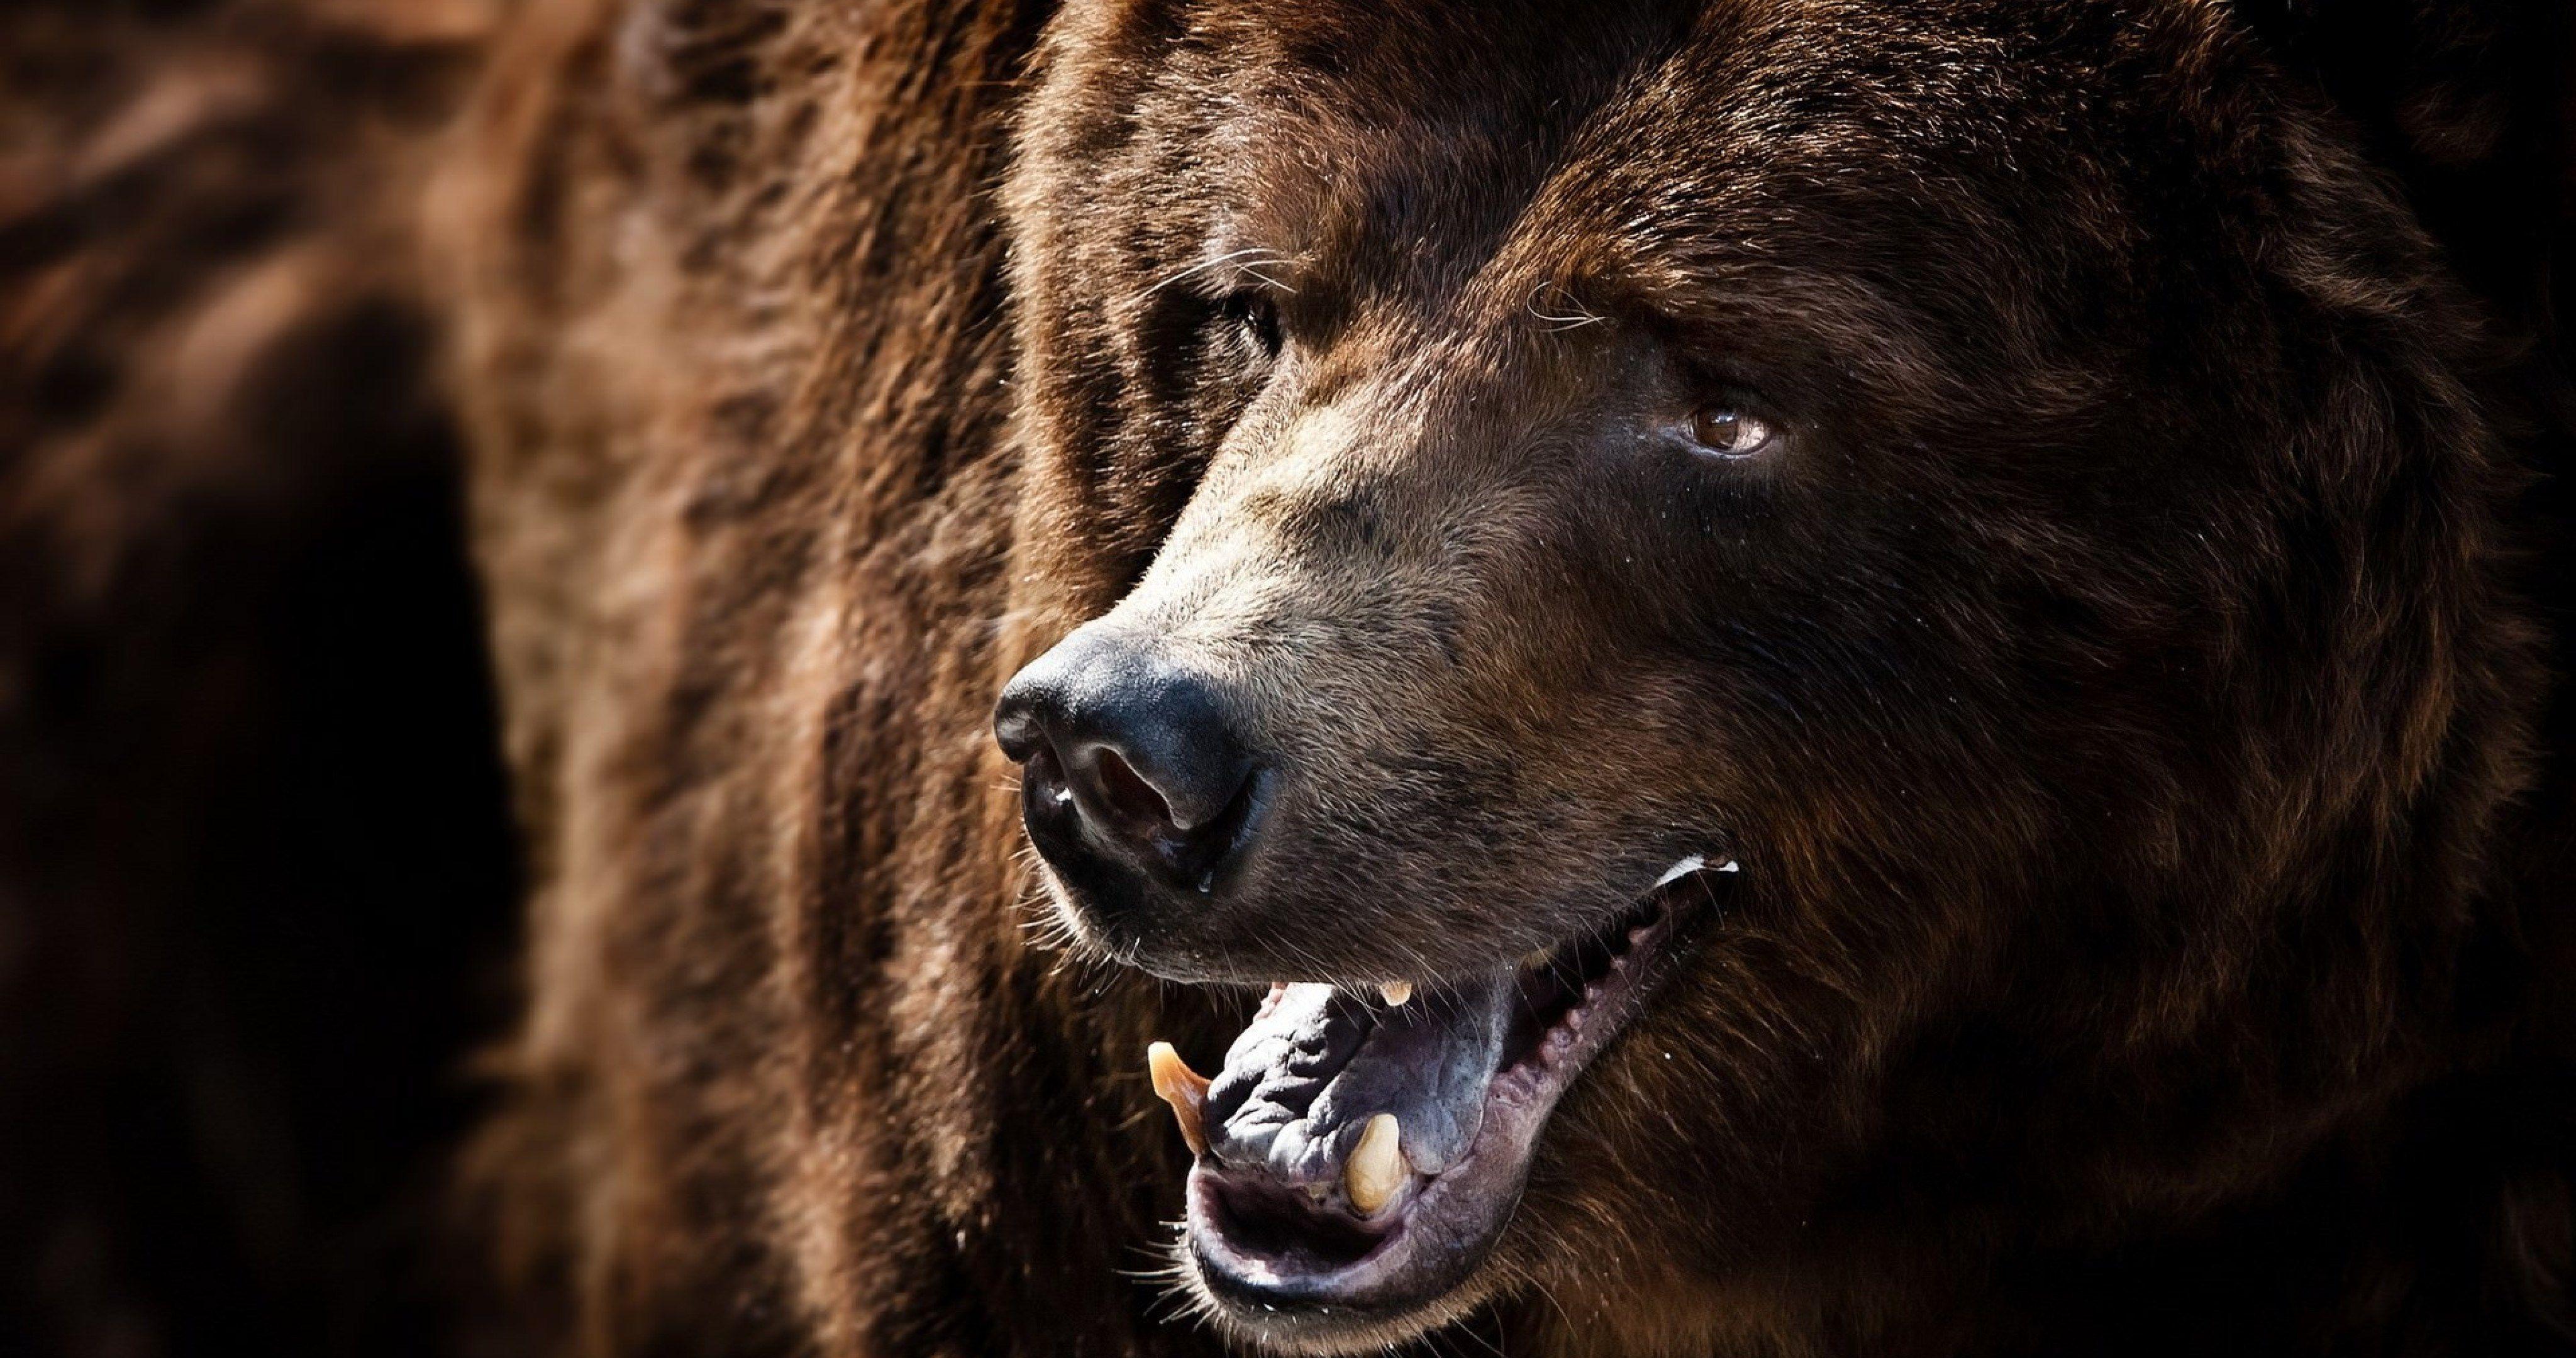 grizzly bear wallpaper 4k ultra hd wallpaper Bear, Bear